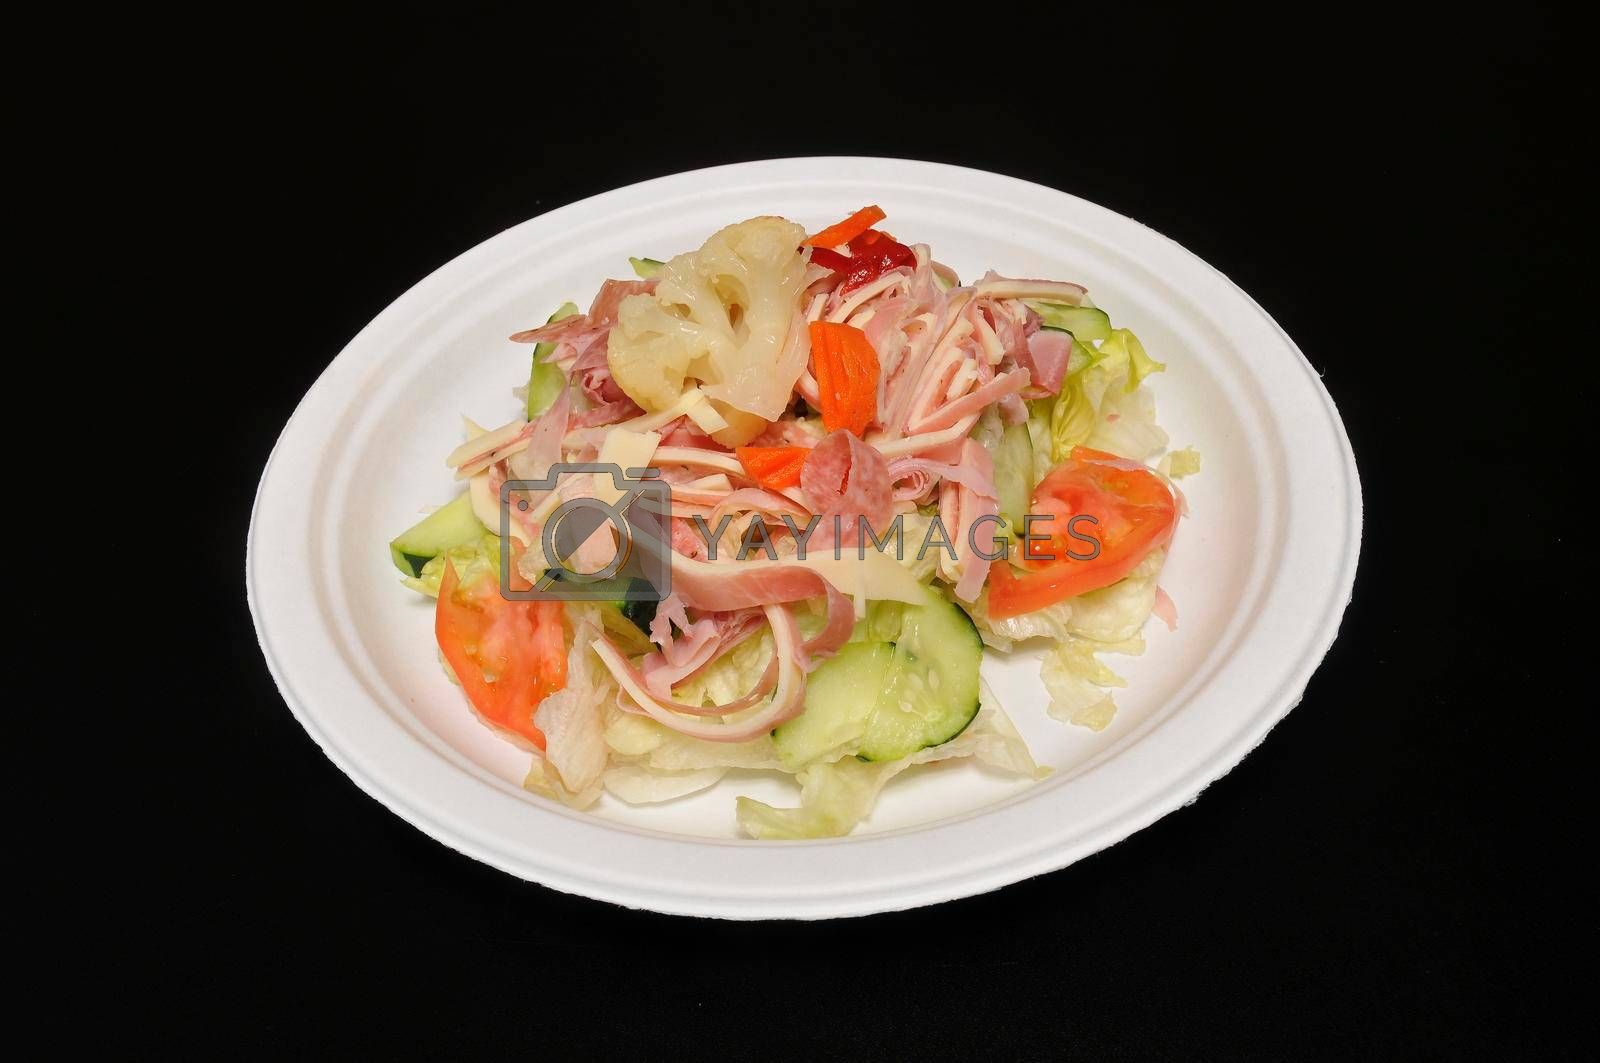 Delicious Italian cuisine known as the antipasto salad